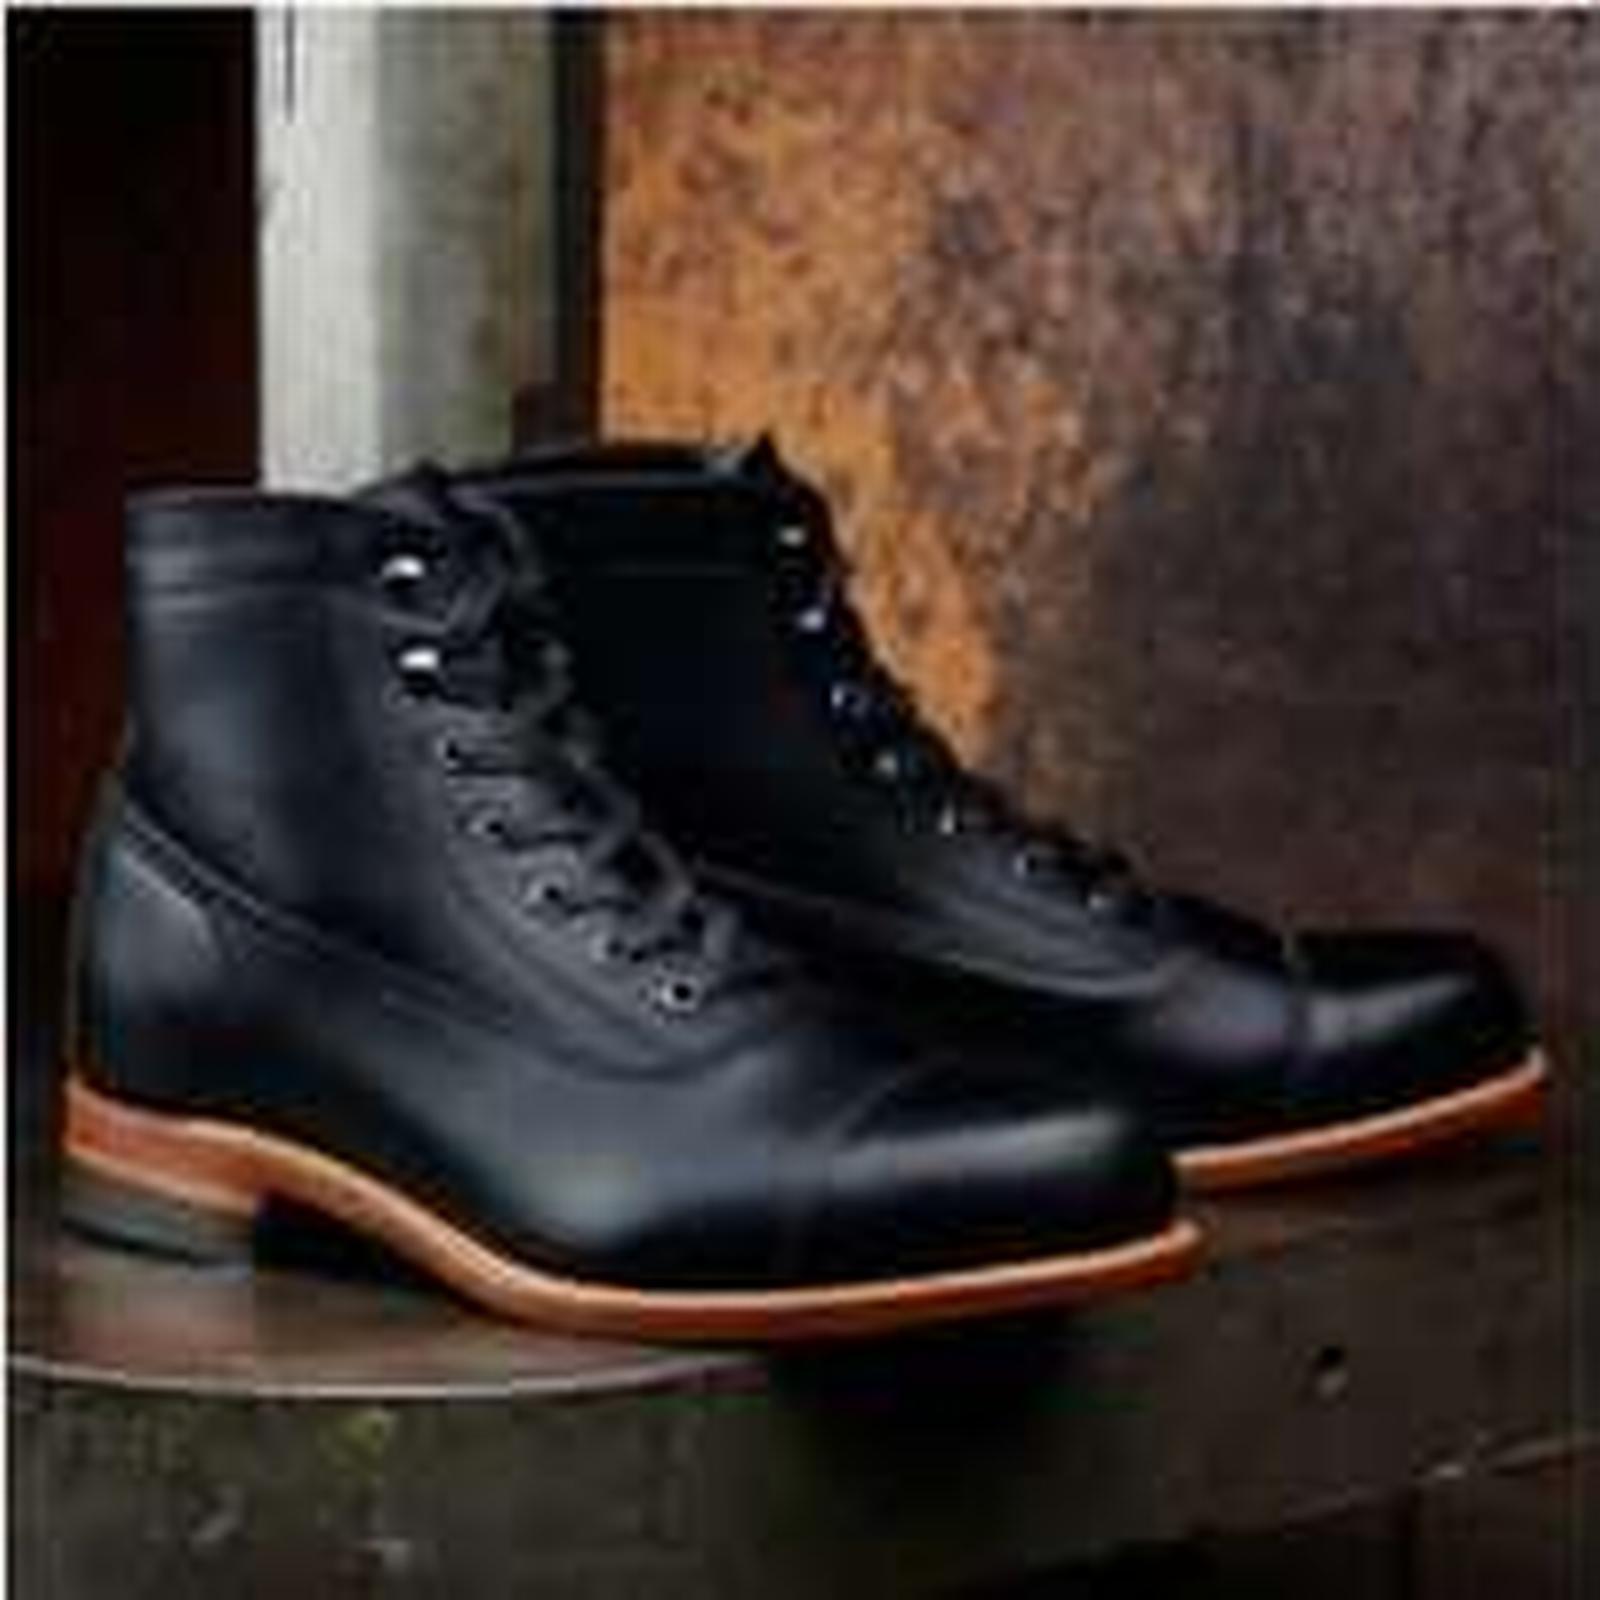 Bonanza (Global) Handmade Ankle Men Black Real Leather Ankle Handmade Boot, Mens Leather Boot, Men Boots 5f9922